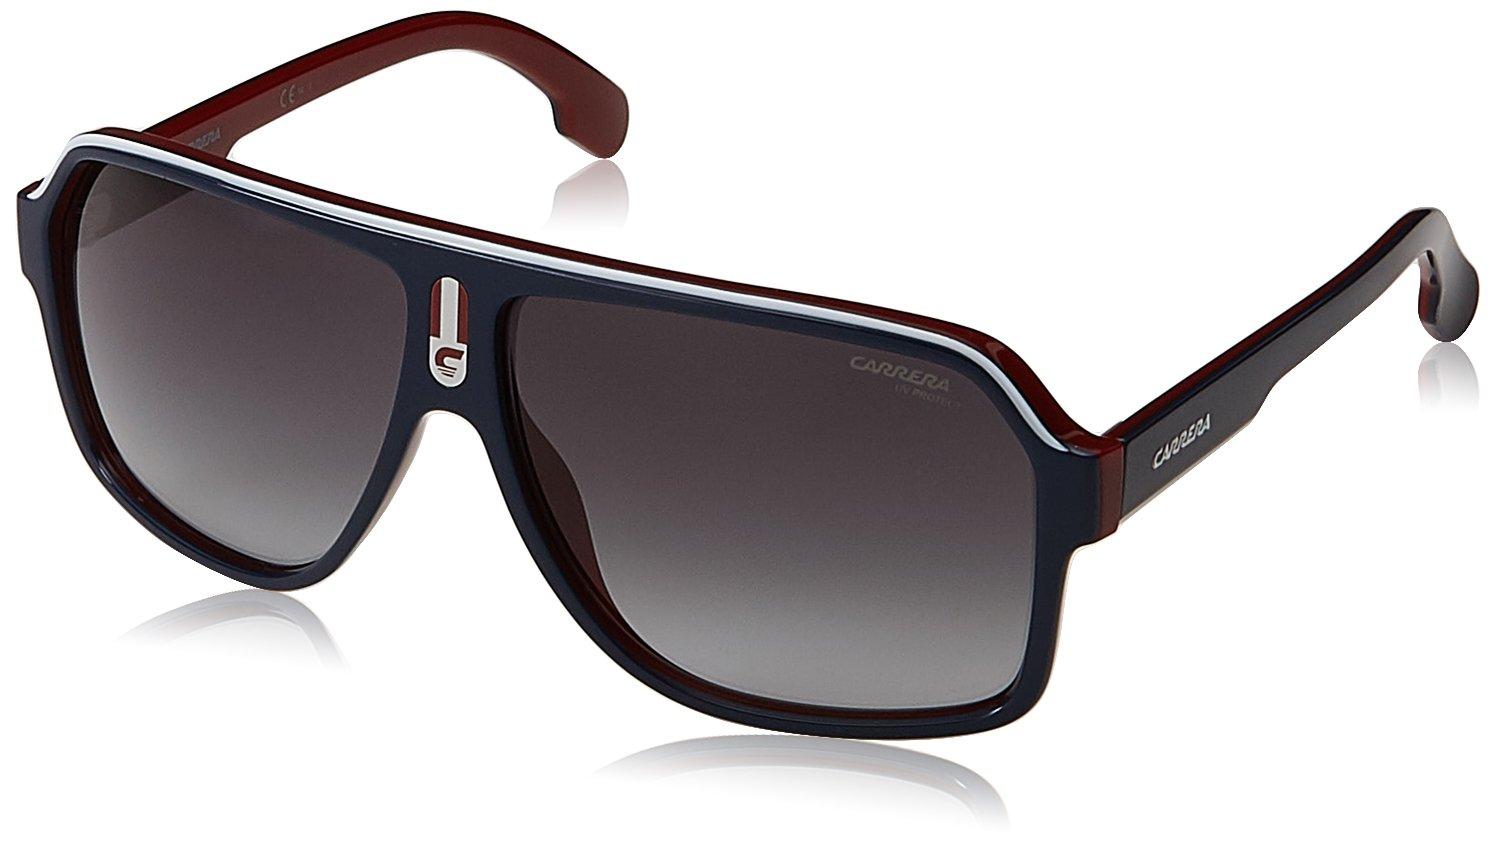 Carrera Mens Ca1001s Aviator Sunglasses RED BLACK//DARK GRAY GRADIENT 62 mm